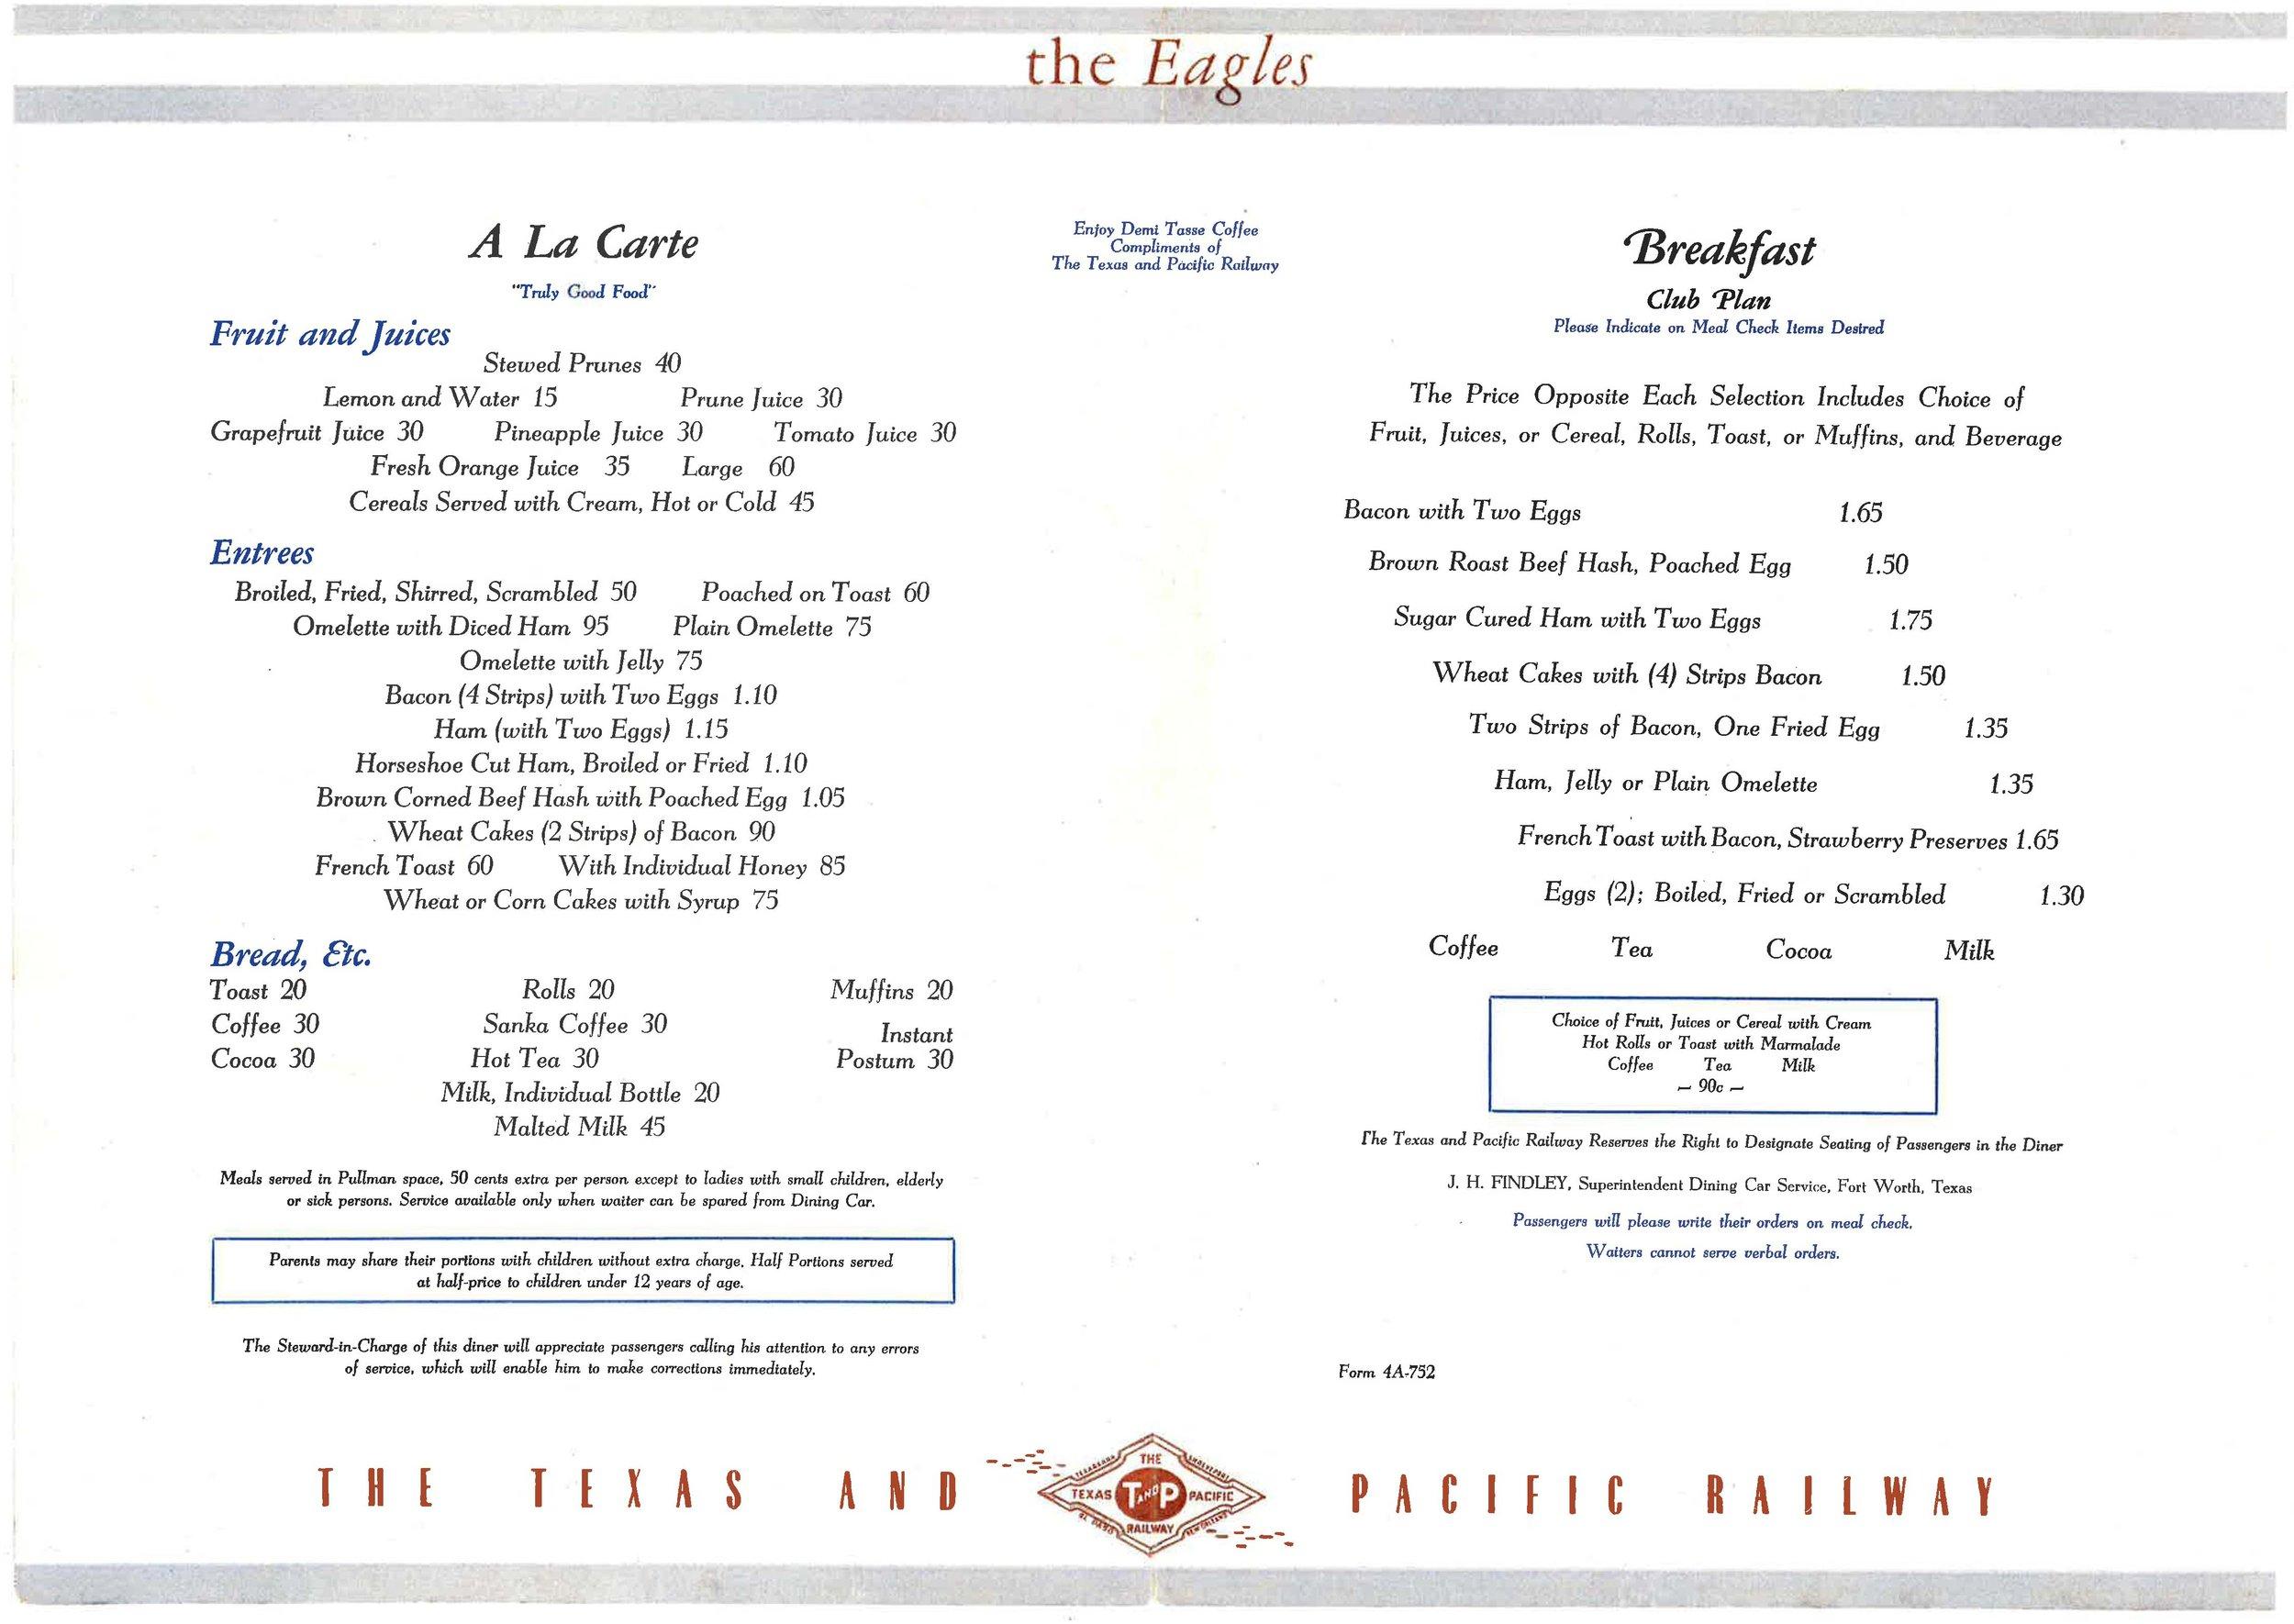 Texas+And+Pacific+Railway+the+Eagles+Breakfast+Menu 2.jpg